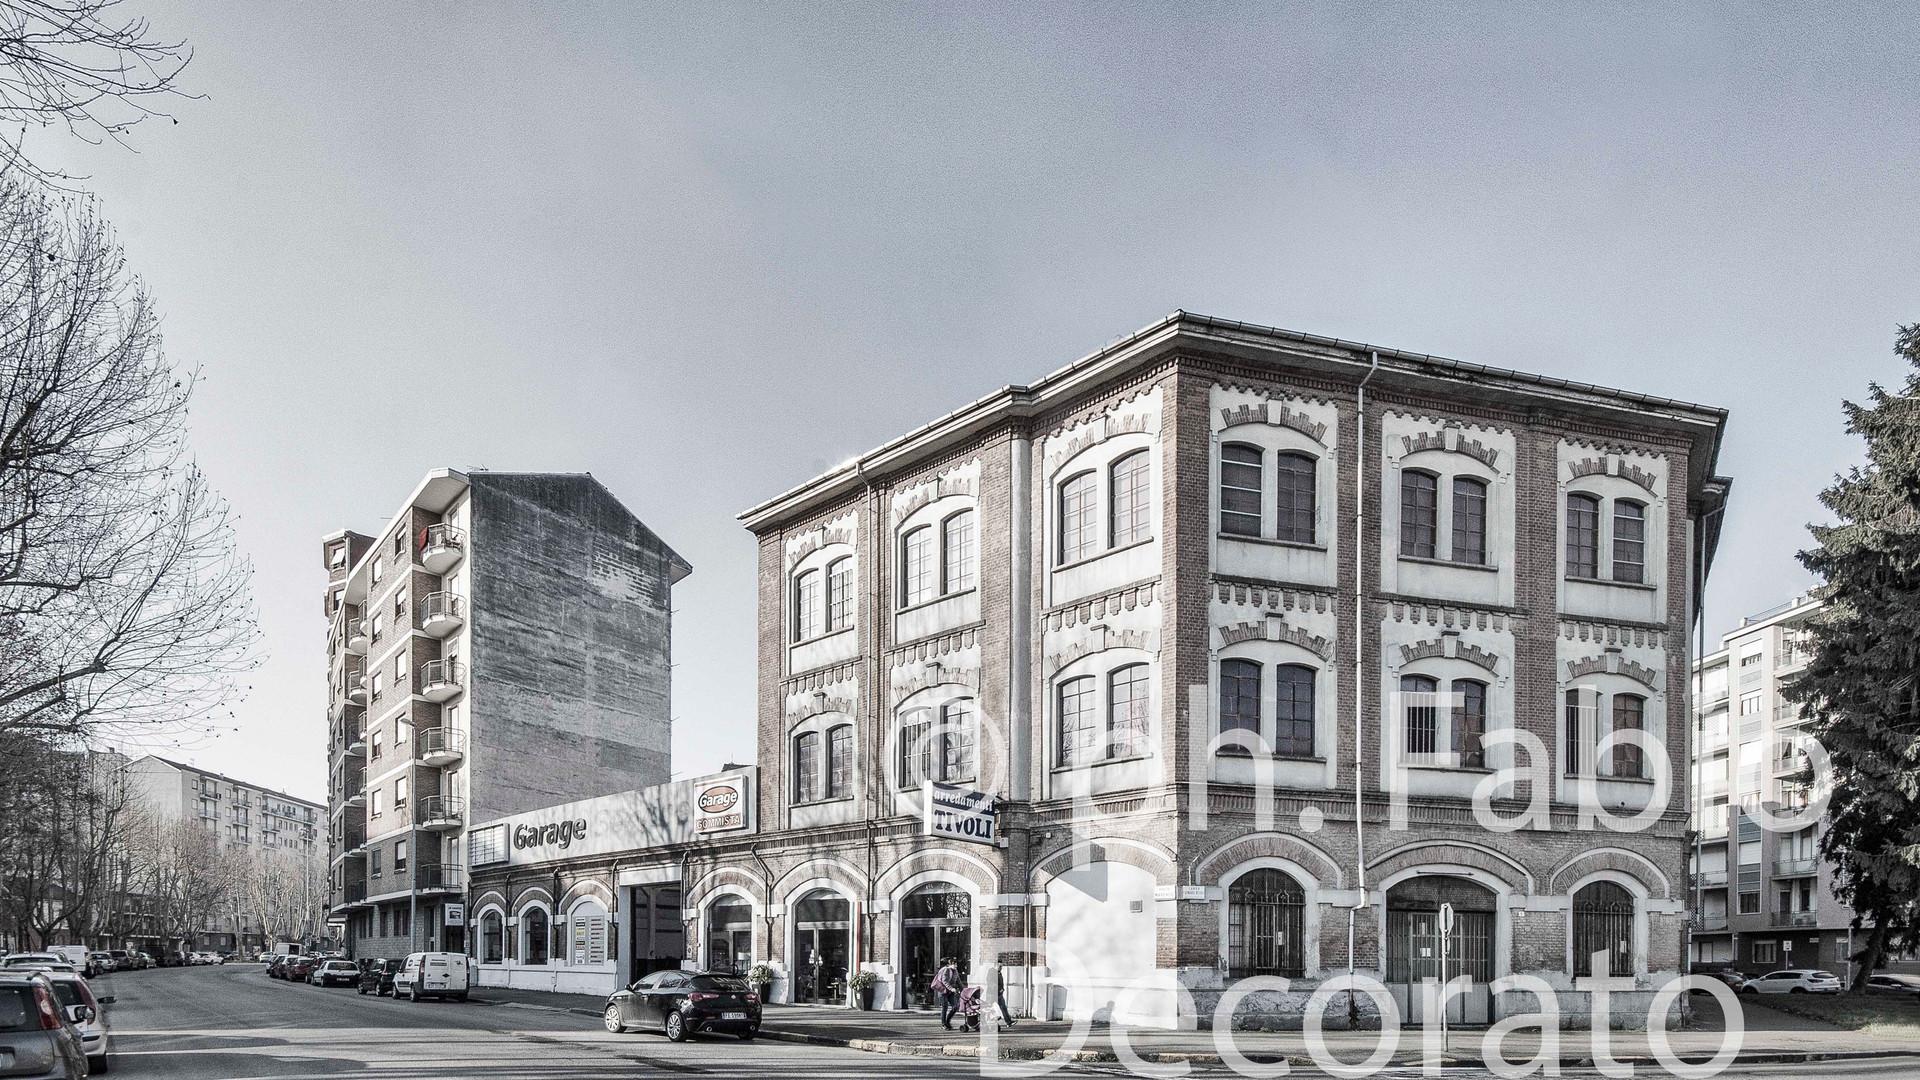 Spalto Marengo, Alessandria